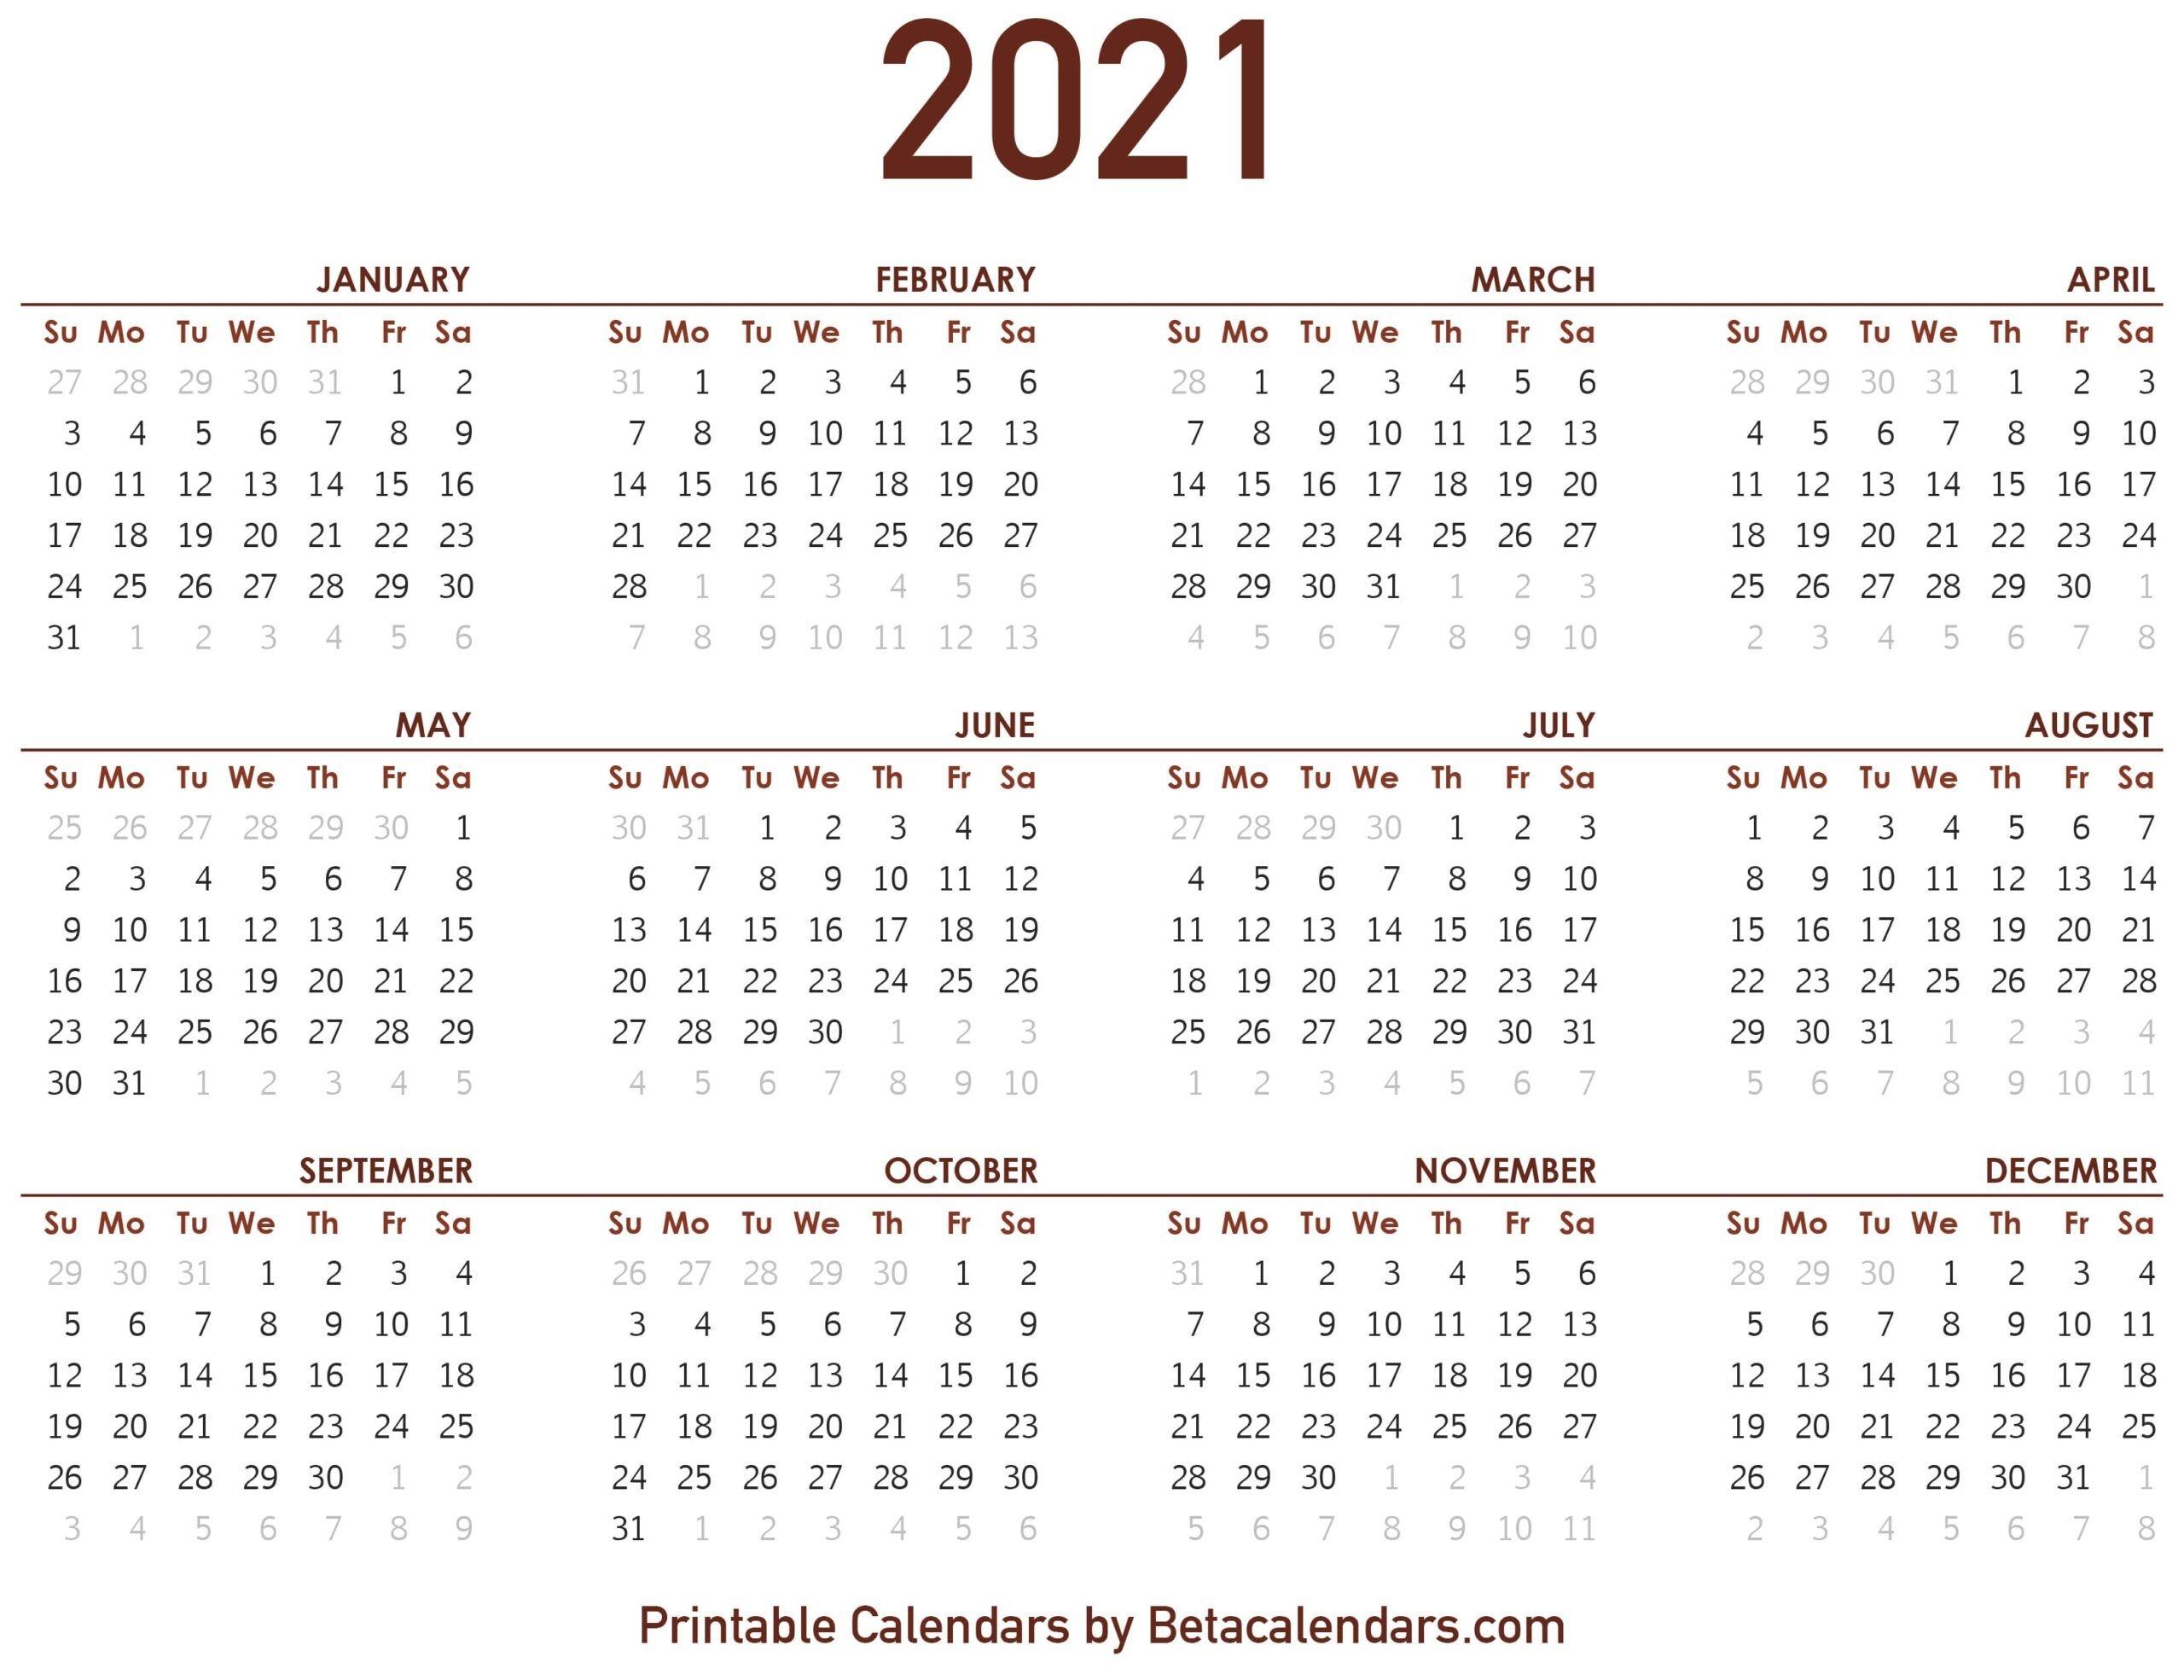 2021 calendar beta calendars